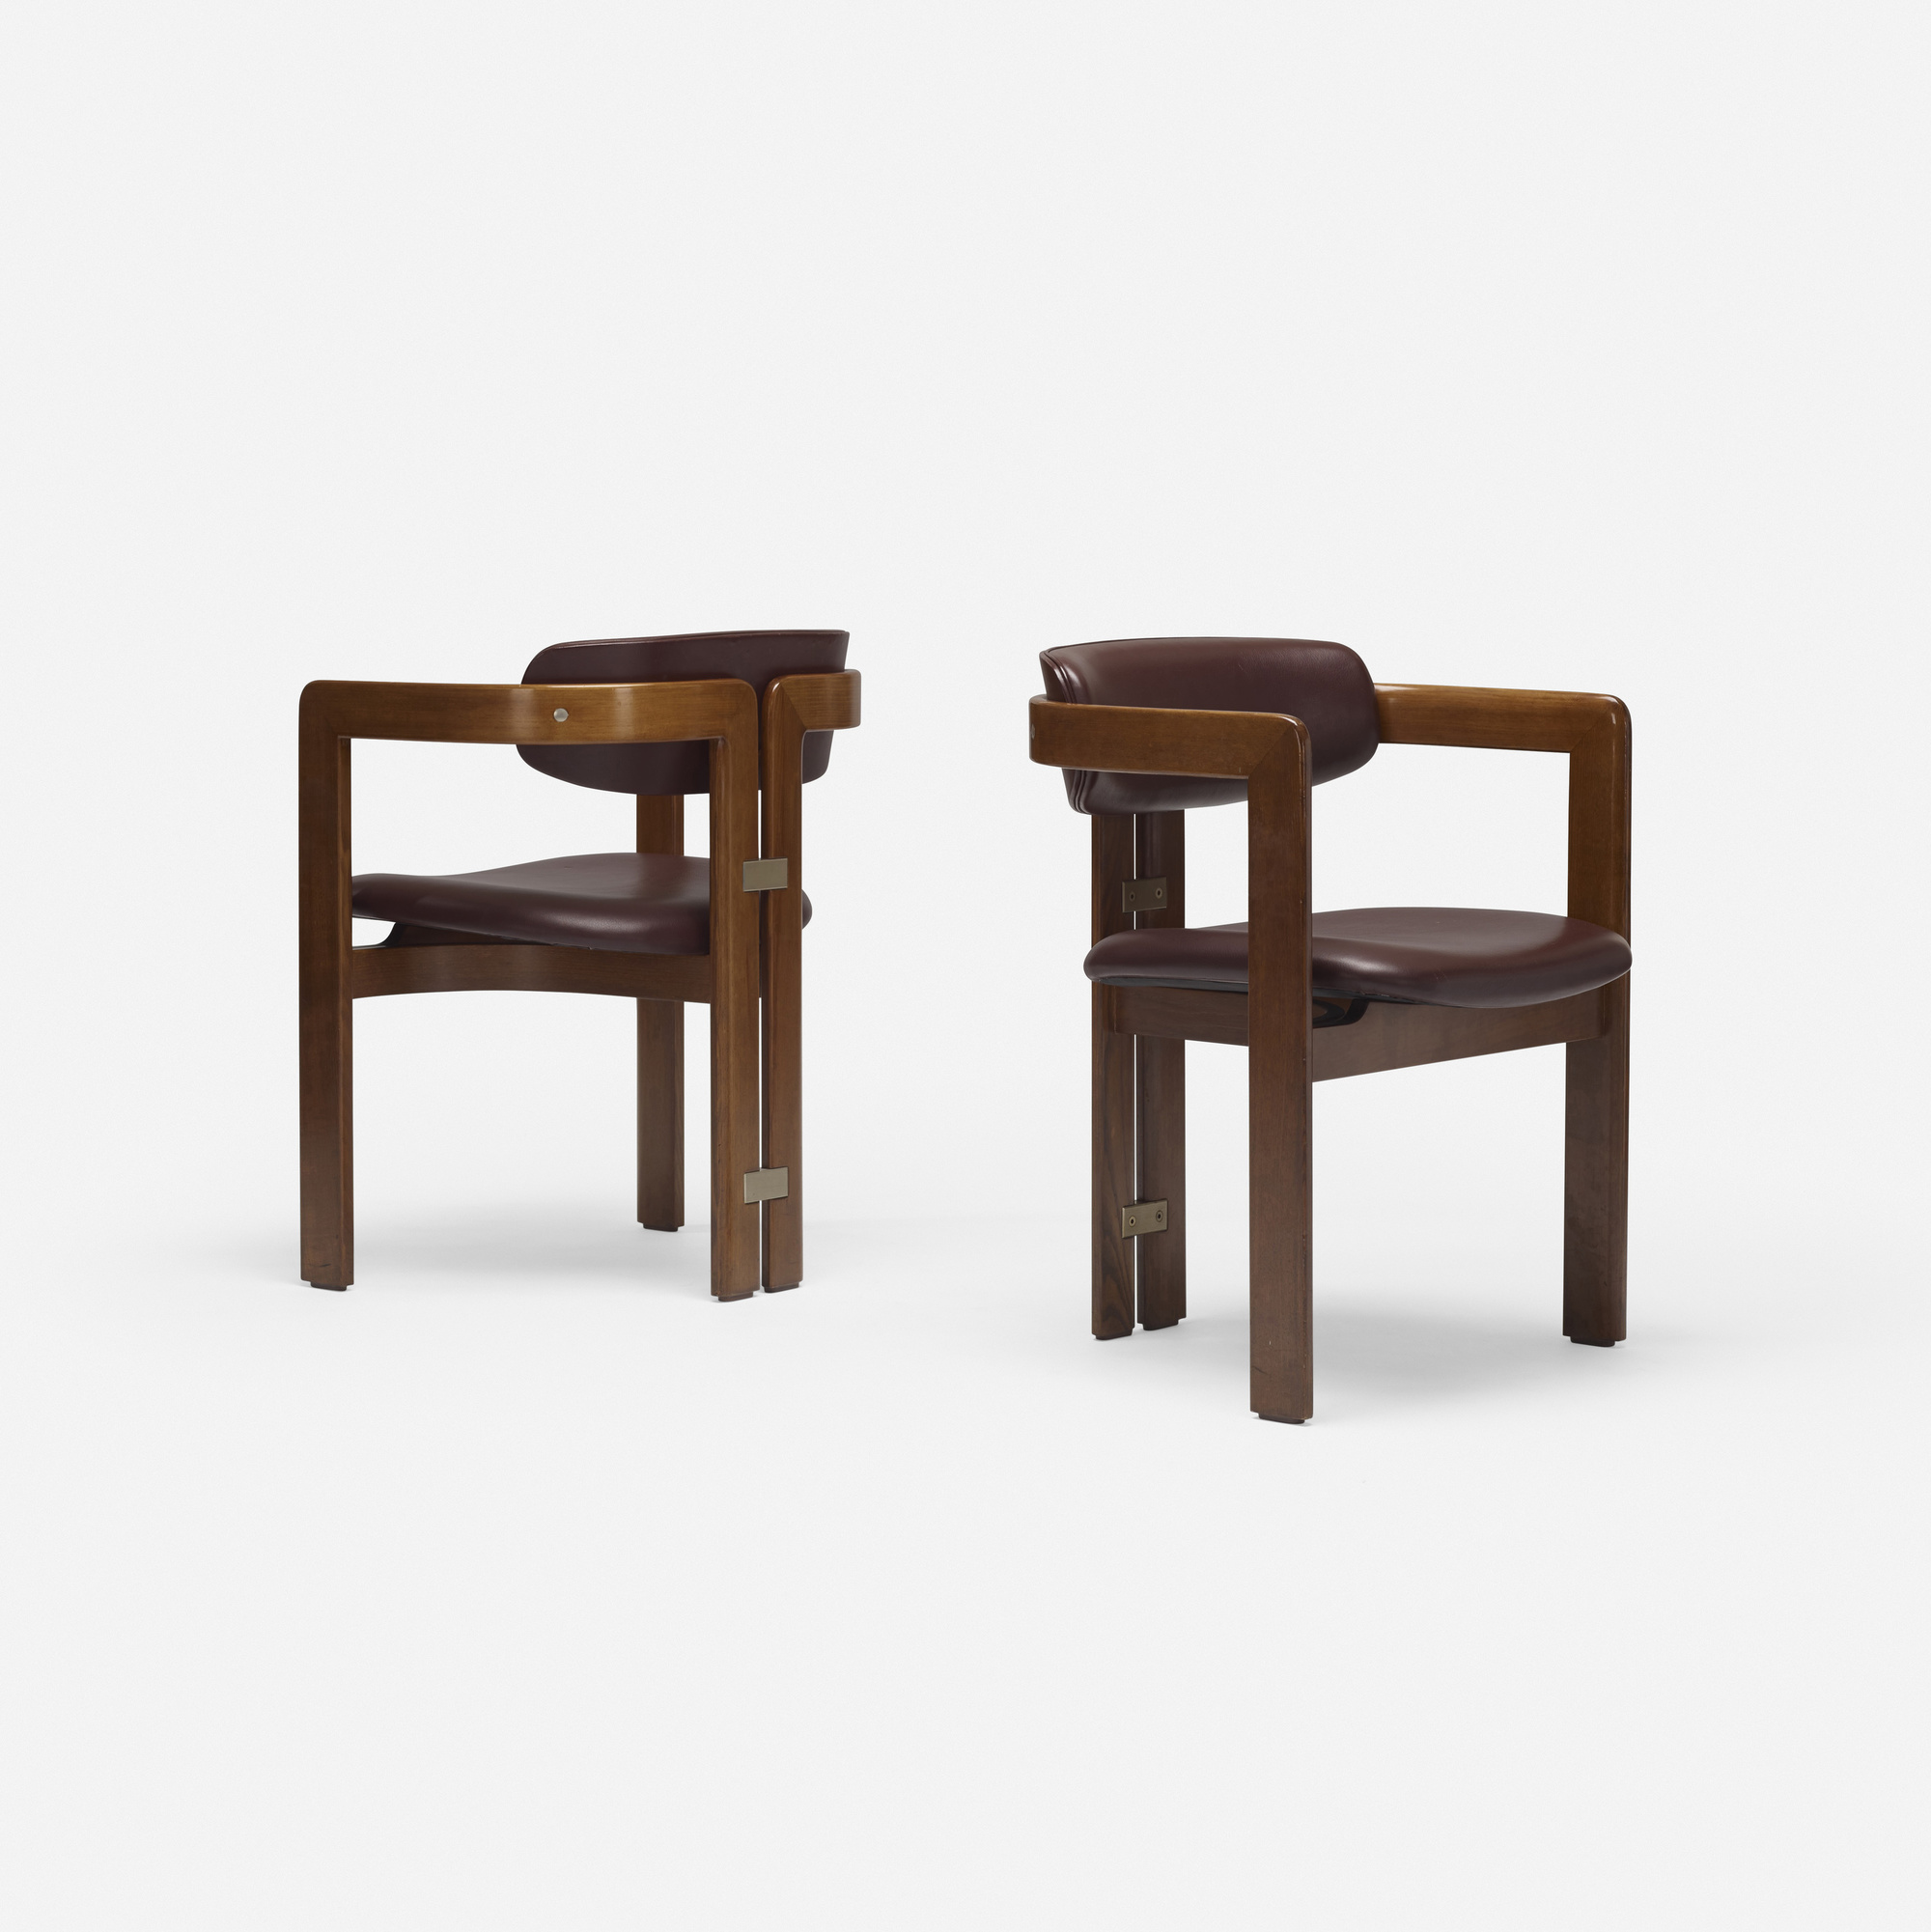 711: Augusto Savini / Pamplona dining chairs, pair (2 of 4)